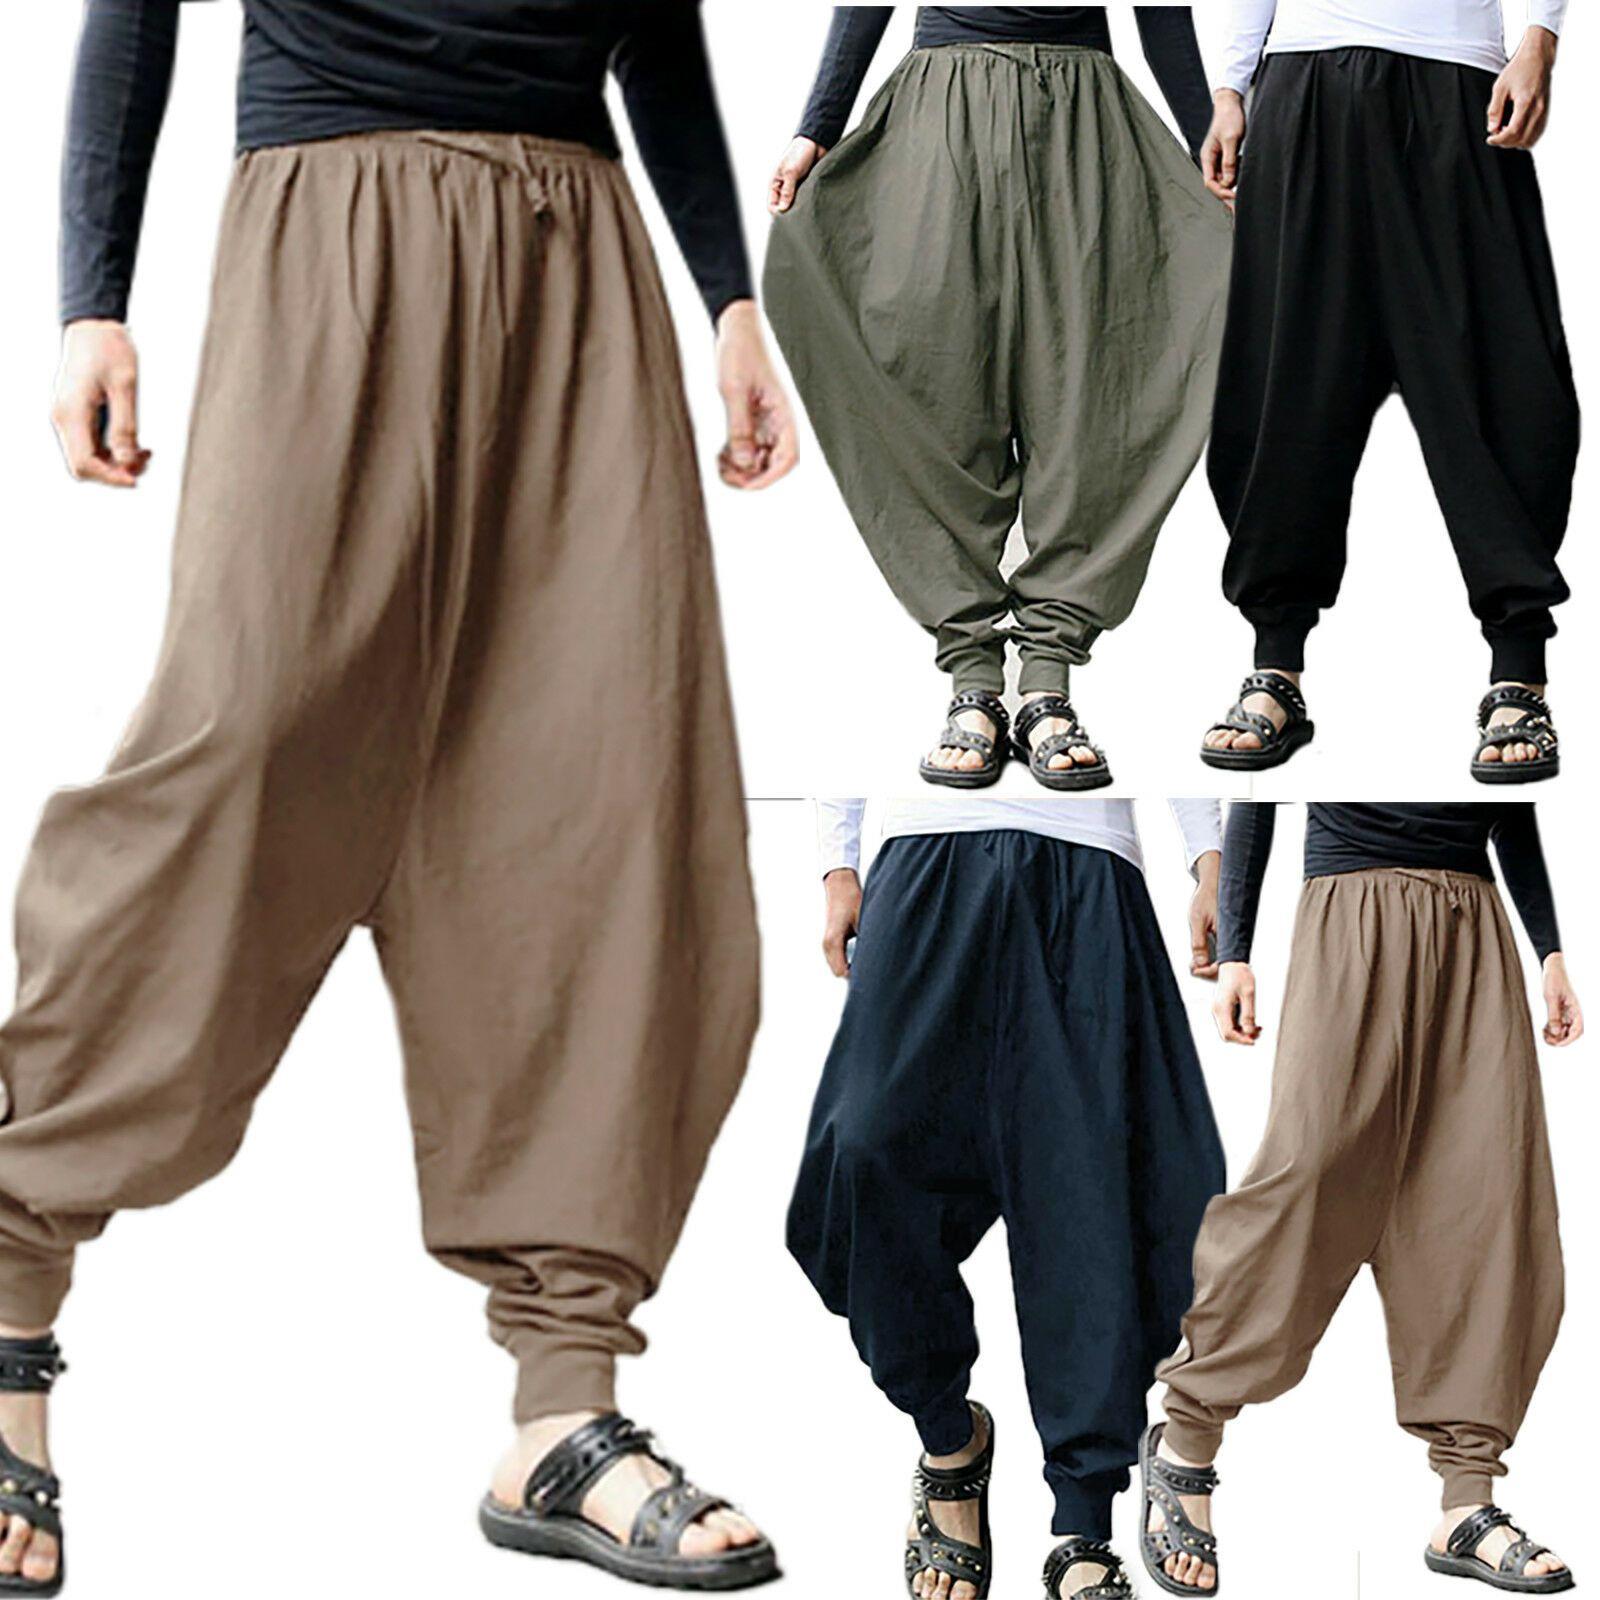 Mens Harem Pants Baggy Elastic Trousers Hippie Yoga Loose Summer Casual Bottoms